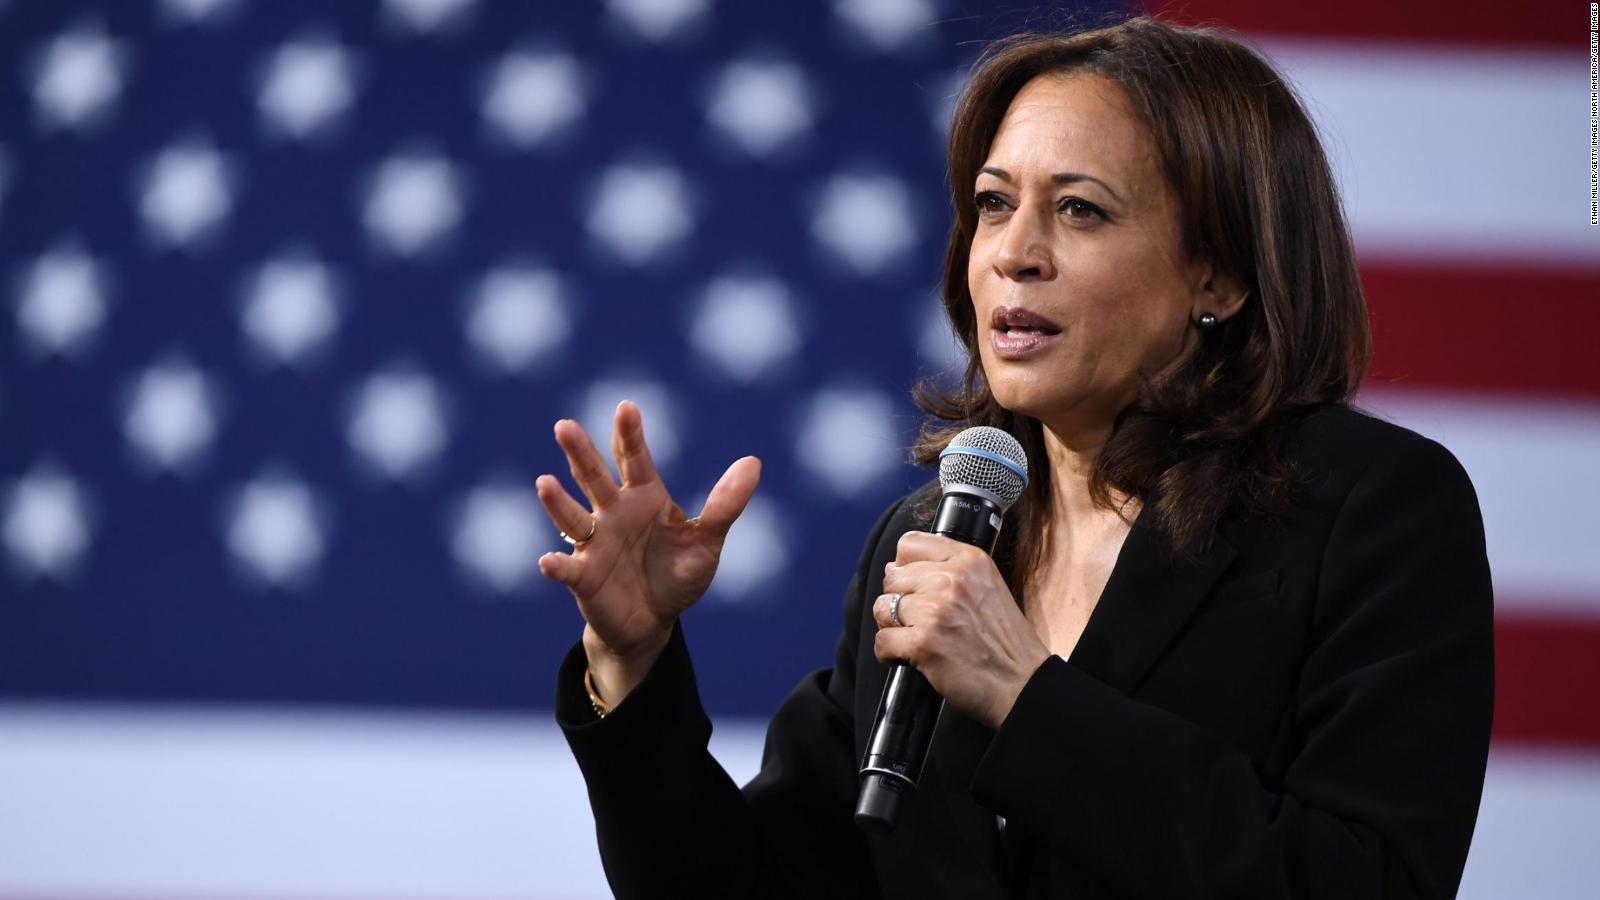 Kamala Harris, ¿qué propone la legisladora progresista?